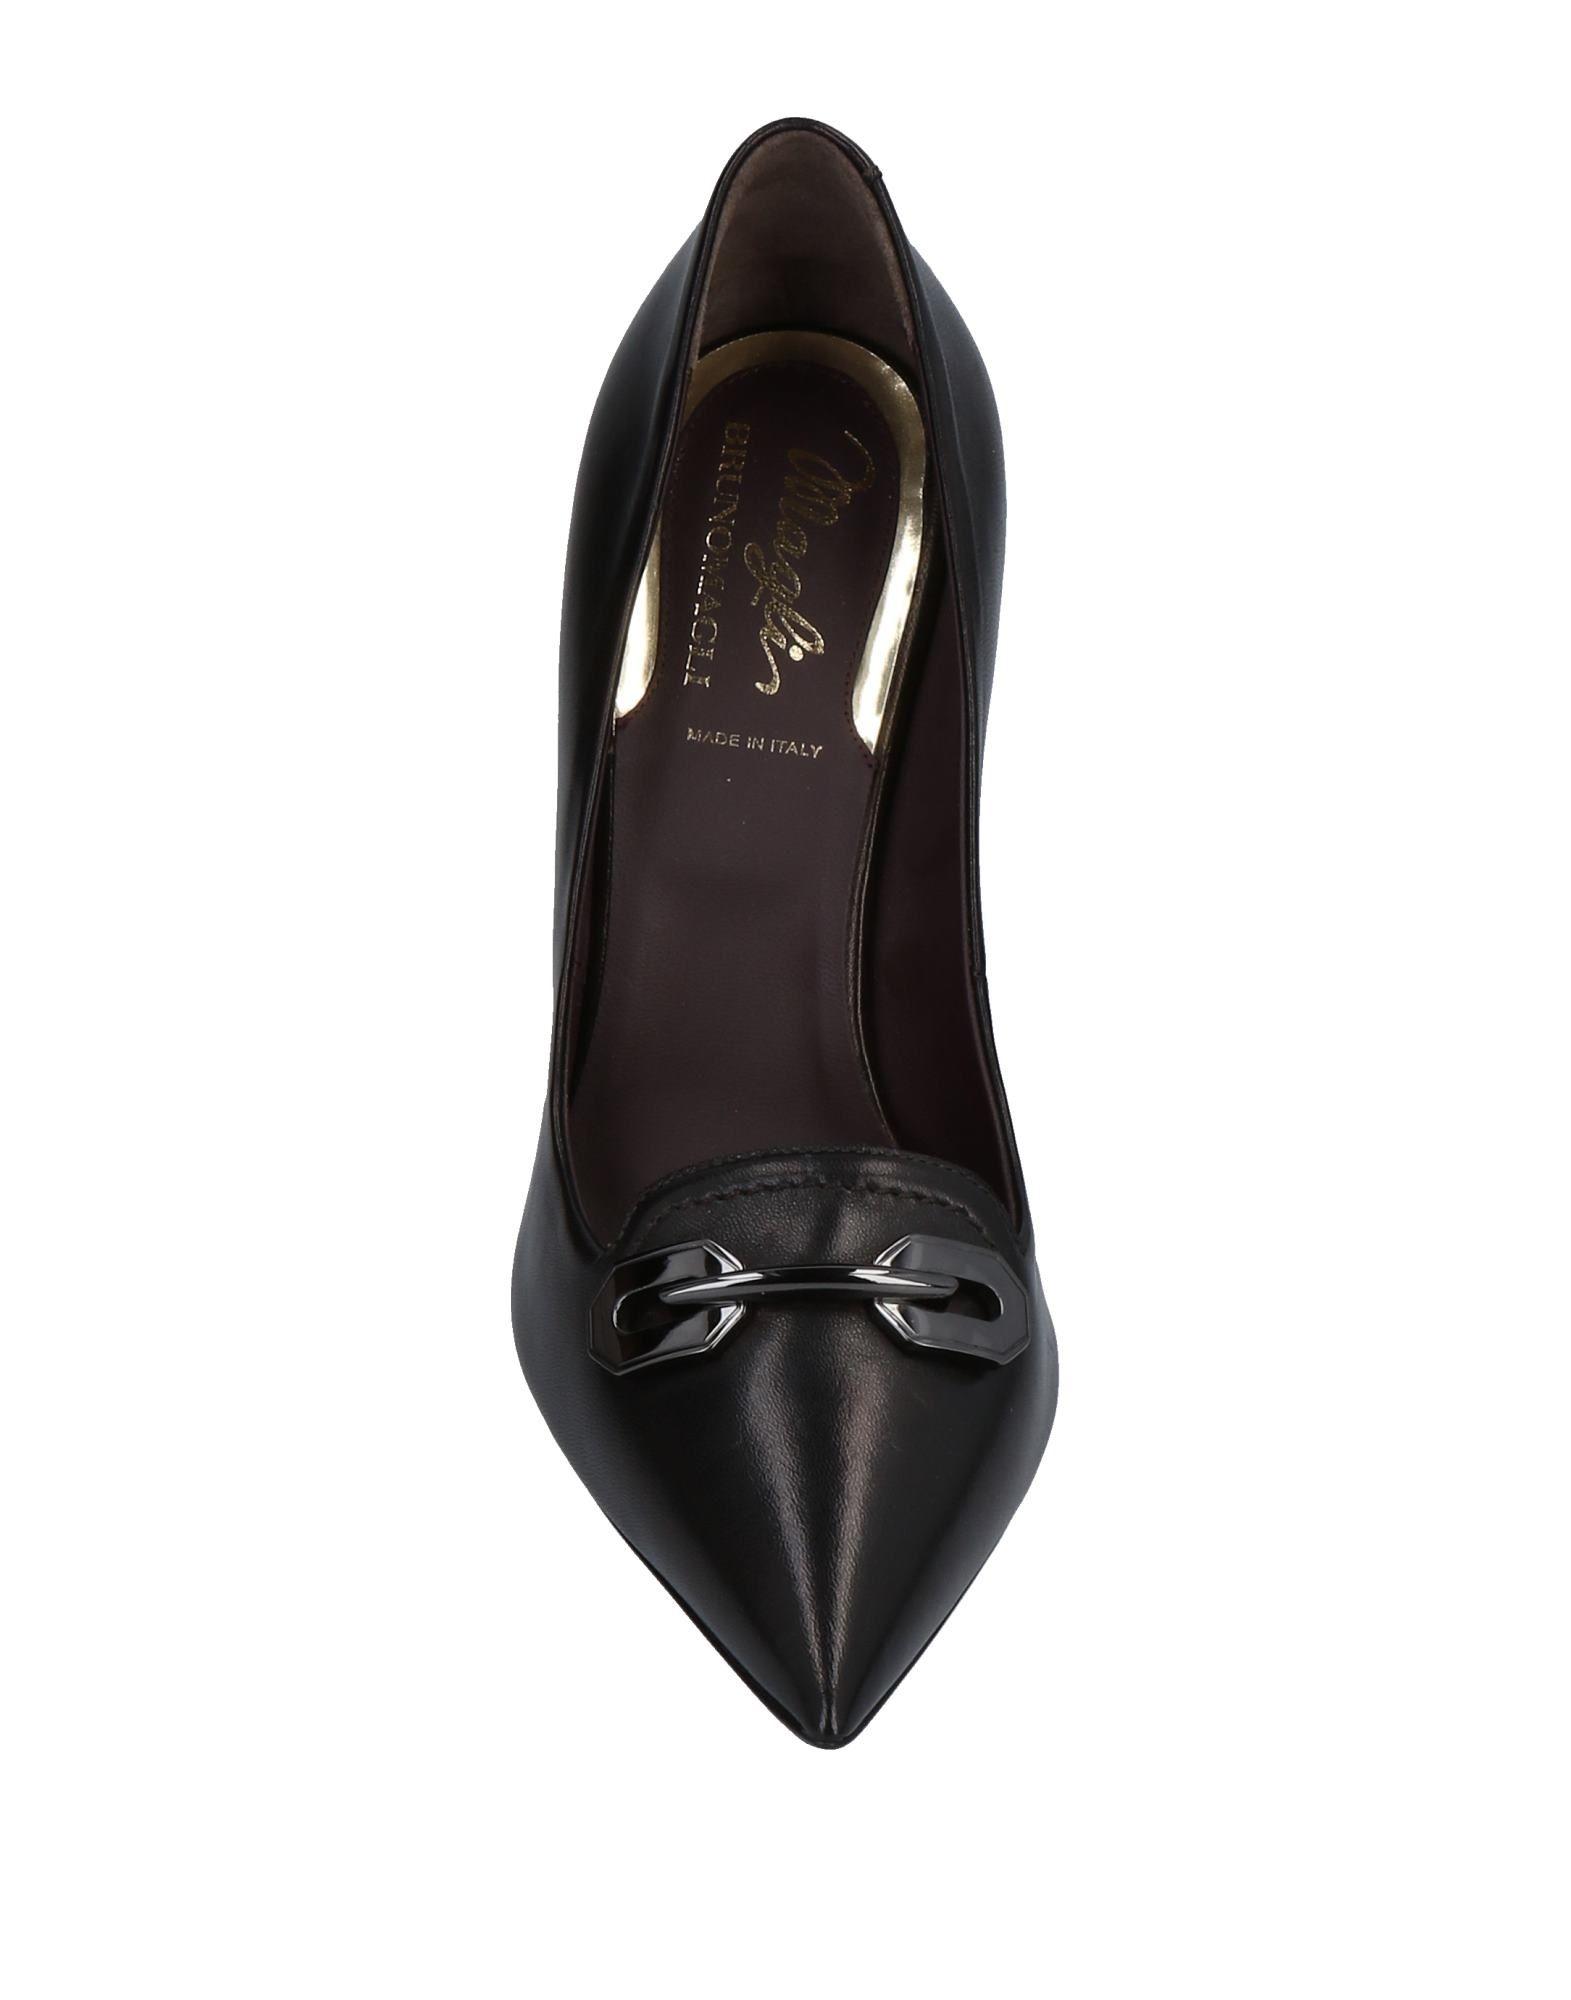 Stilvolle billige Pumps Schuhe Magli By Bruno Magli Pumps billige Damen  11473293EN 21a8bf